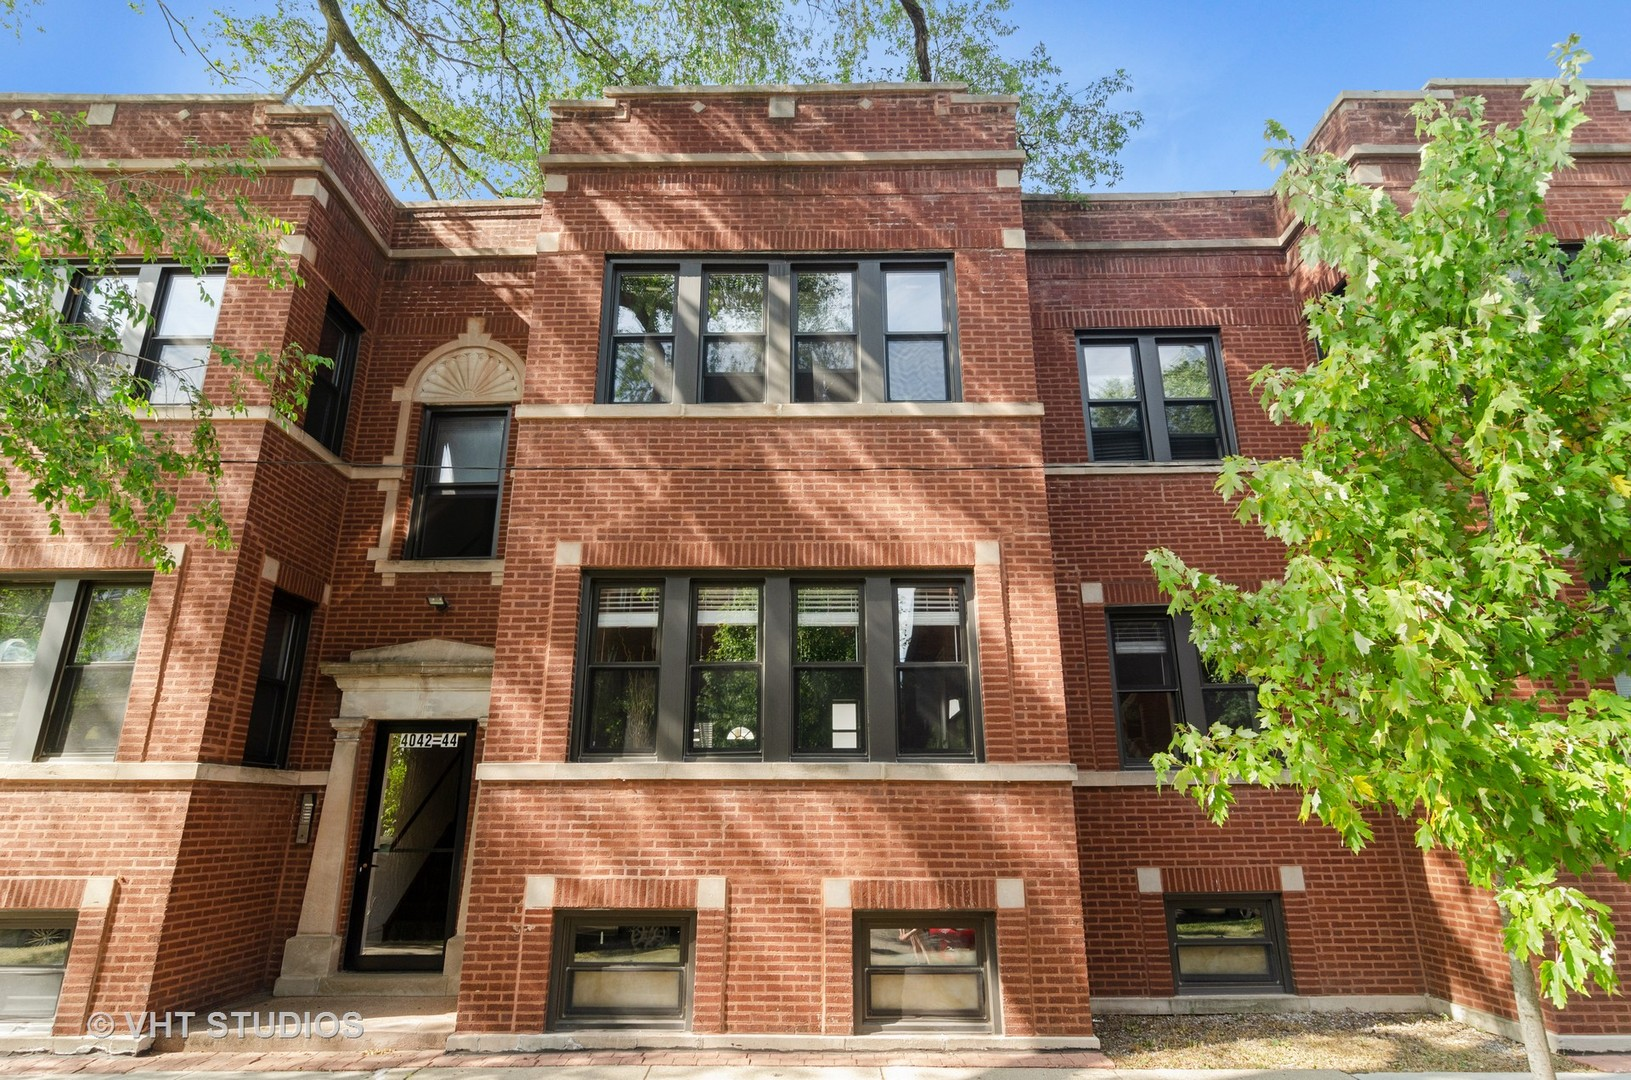 4042 School Unit Unit 2e ,Chicago, Illinois 60641